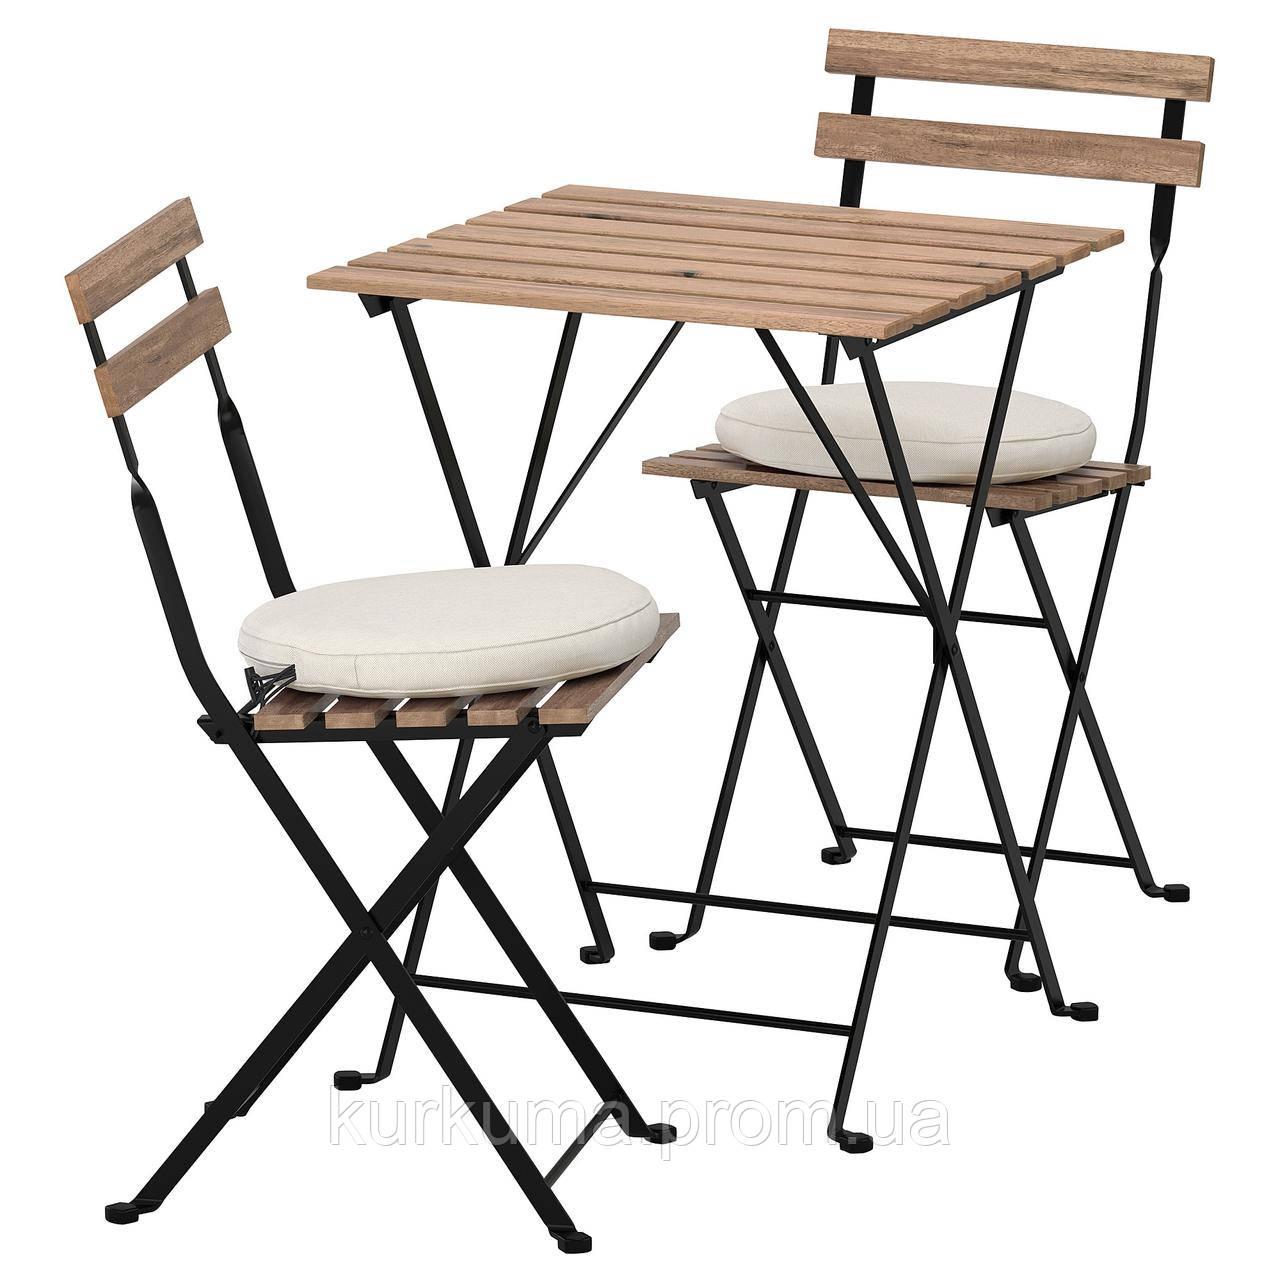 IKEA TARNO Садовый стол и 2 раскладных стула, серо-коричневый, Фрезен/дувхолмен бежевый  (592.708.63)